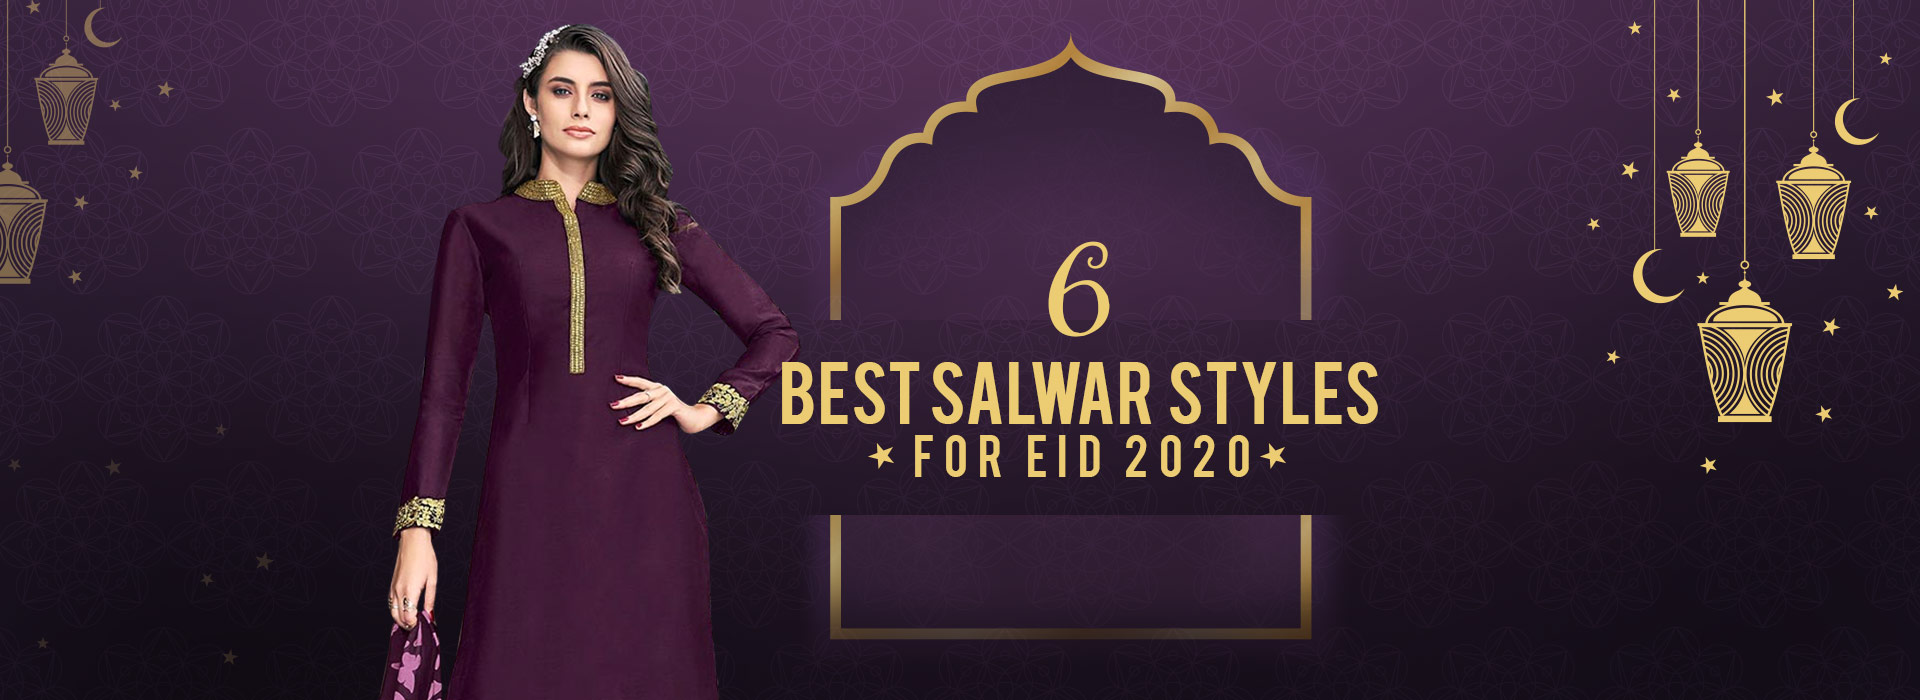 6 Best Salwar Styles for Eid 2020